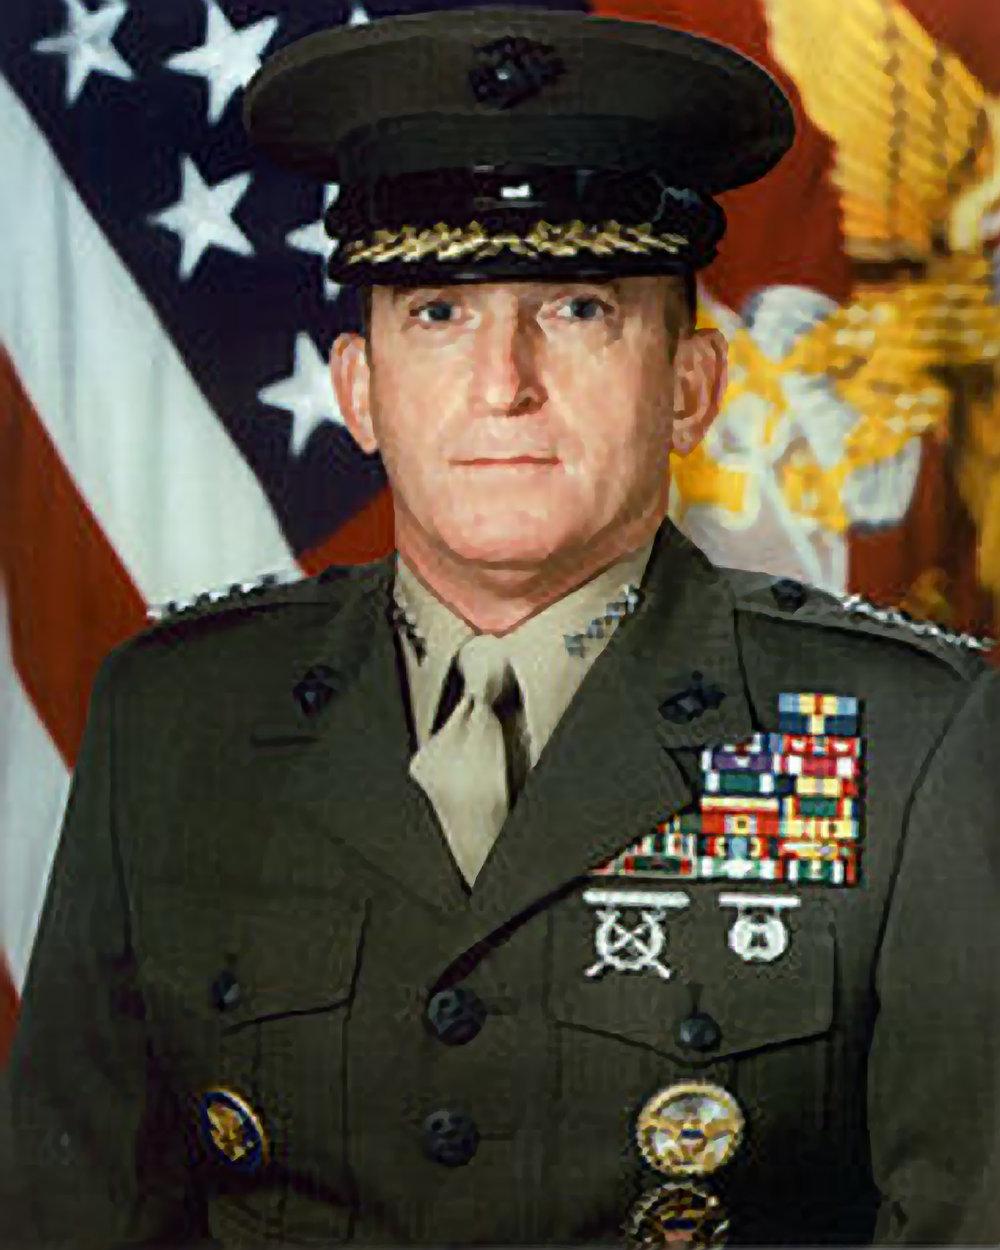 General Charles C. Krulak Commandant USMC (ret)